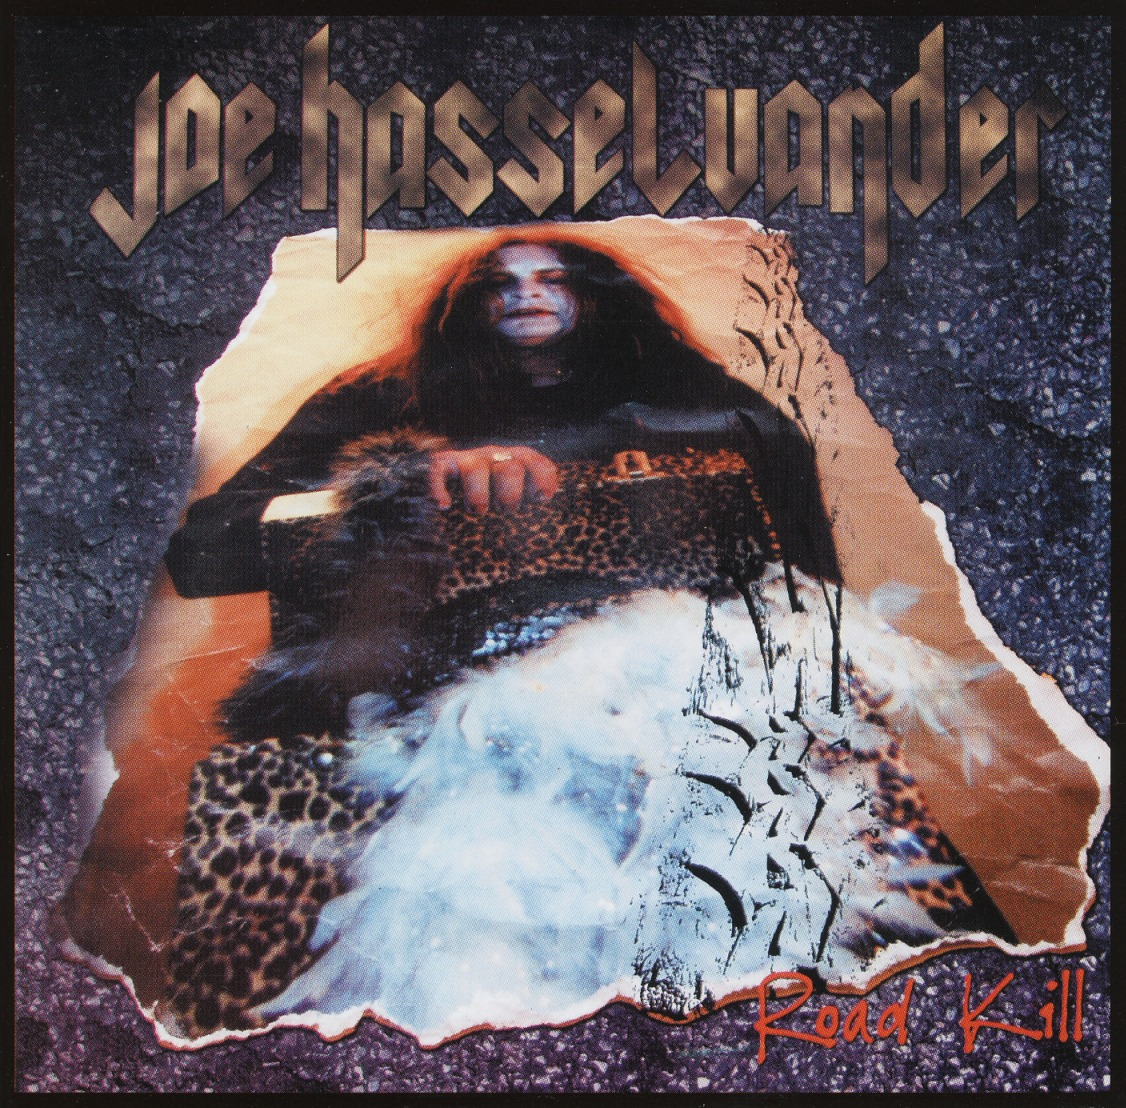 JOE HASSELVANDER(US) / Road Kill + Lady Killer